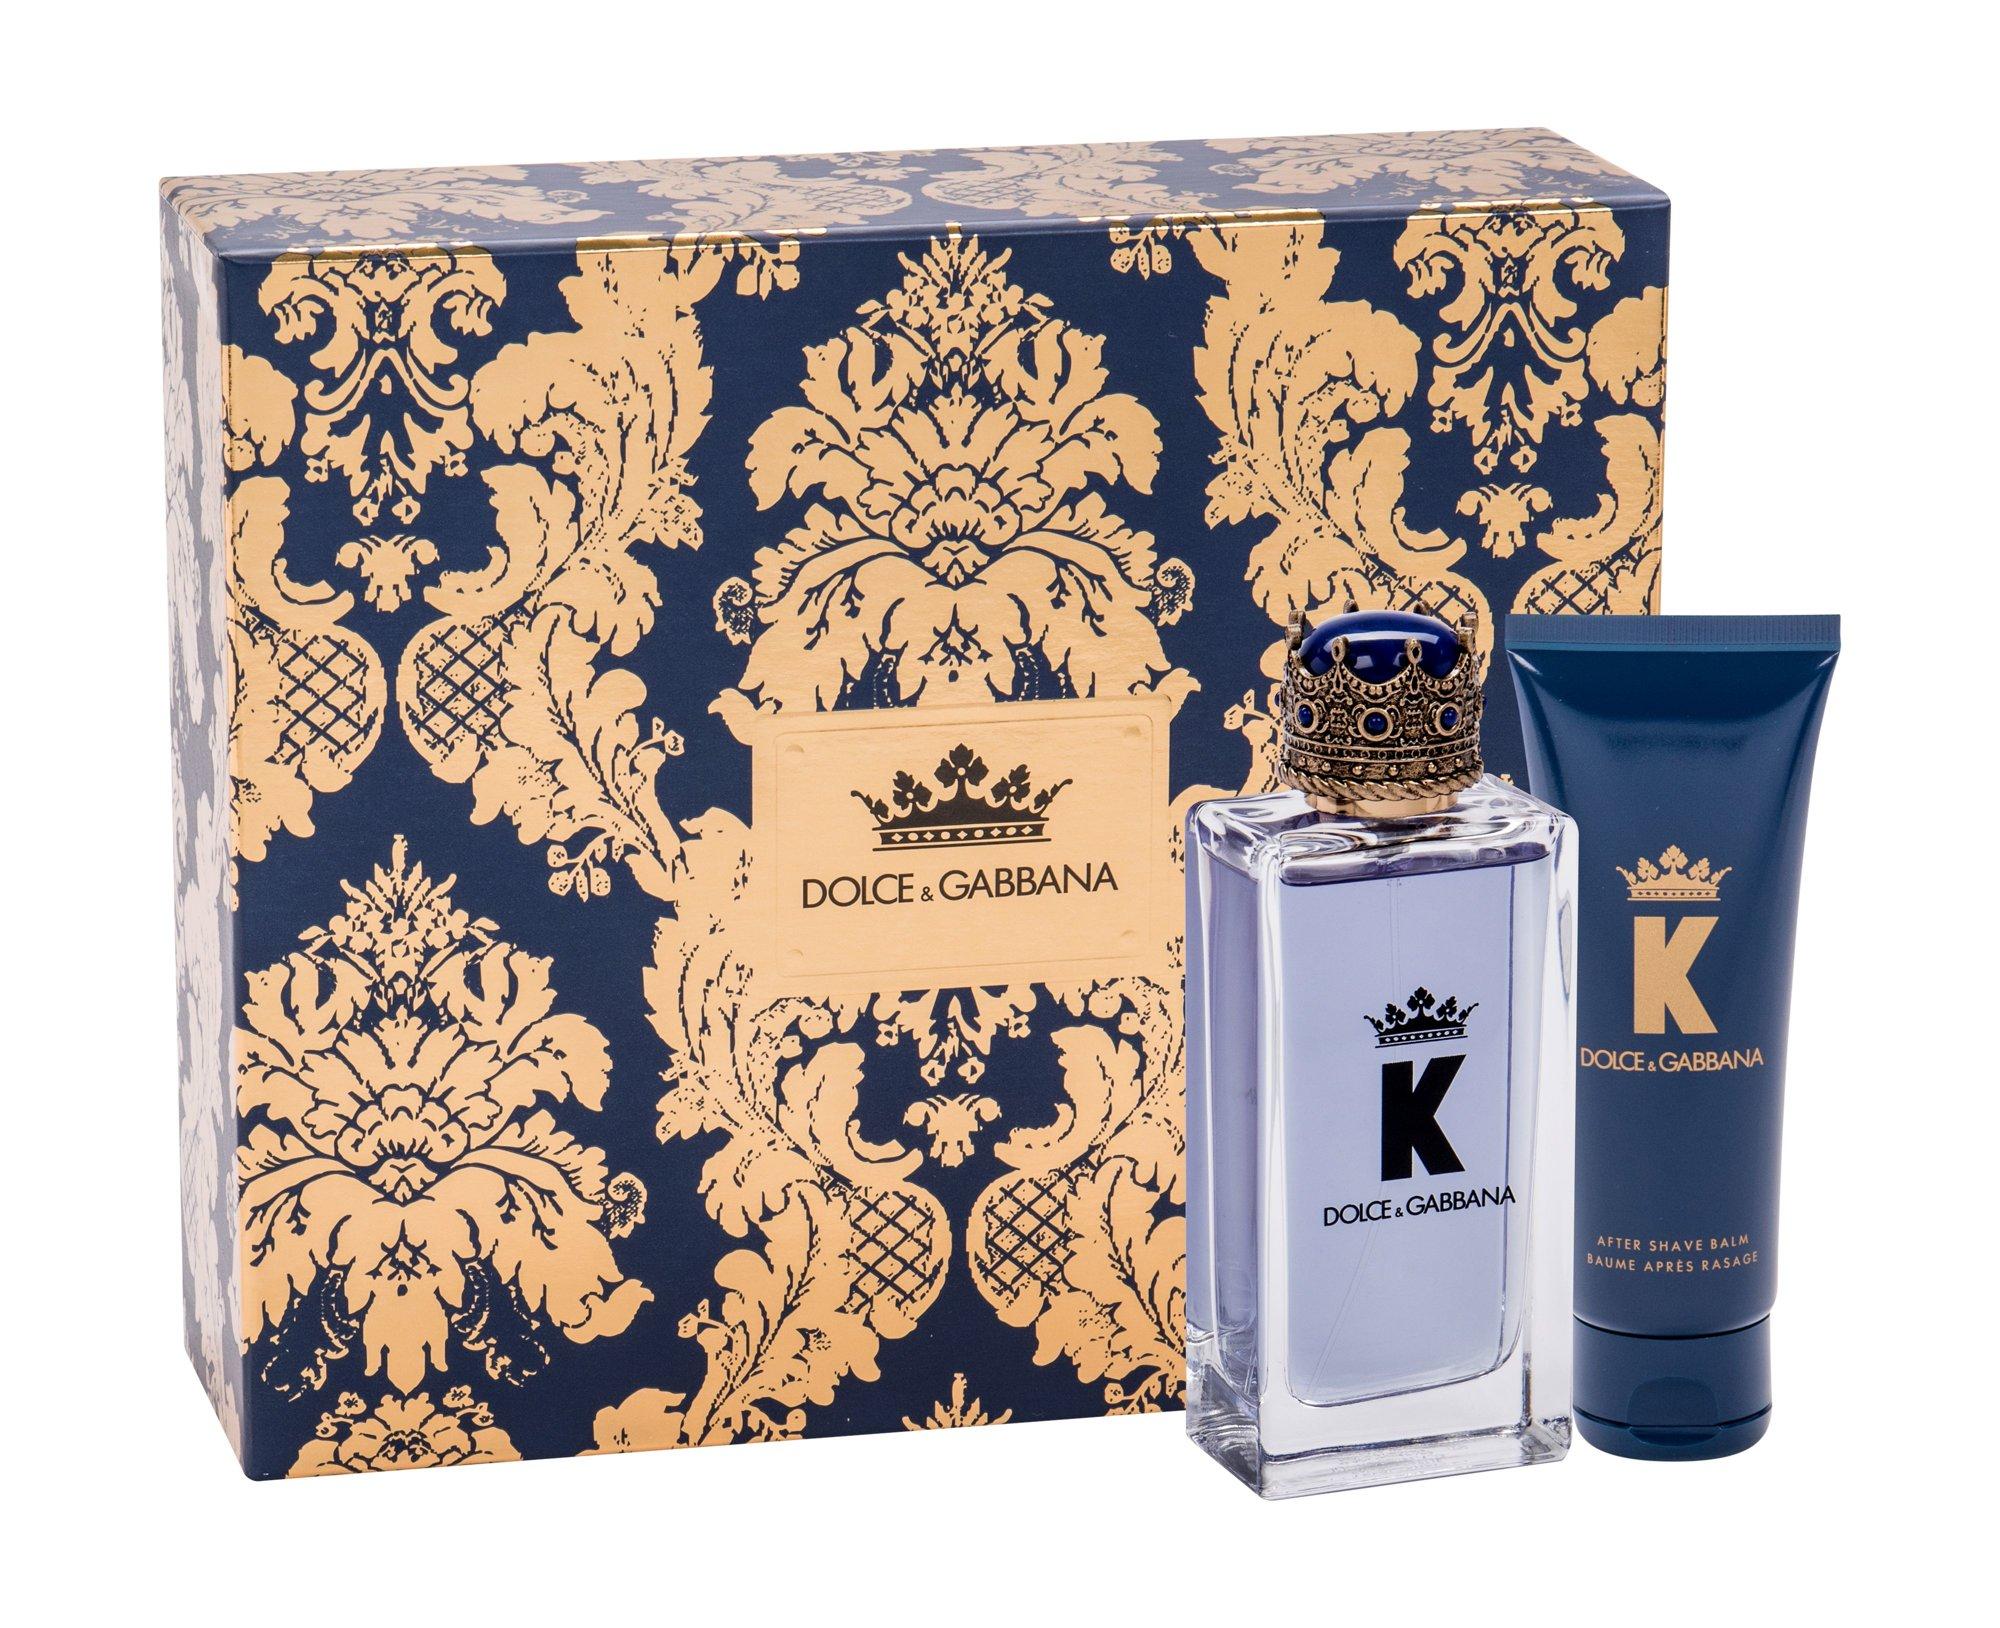 Dolce&Gabbana K Eau de Toilette 100ml